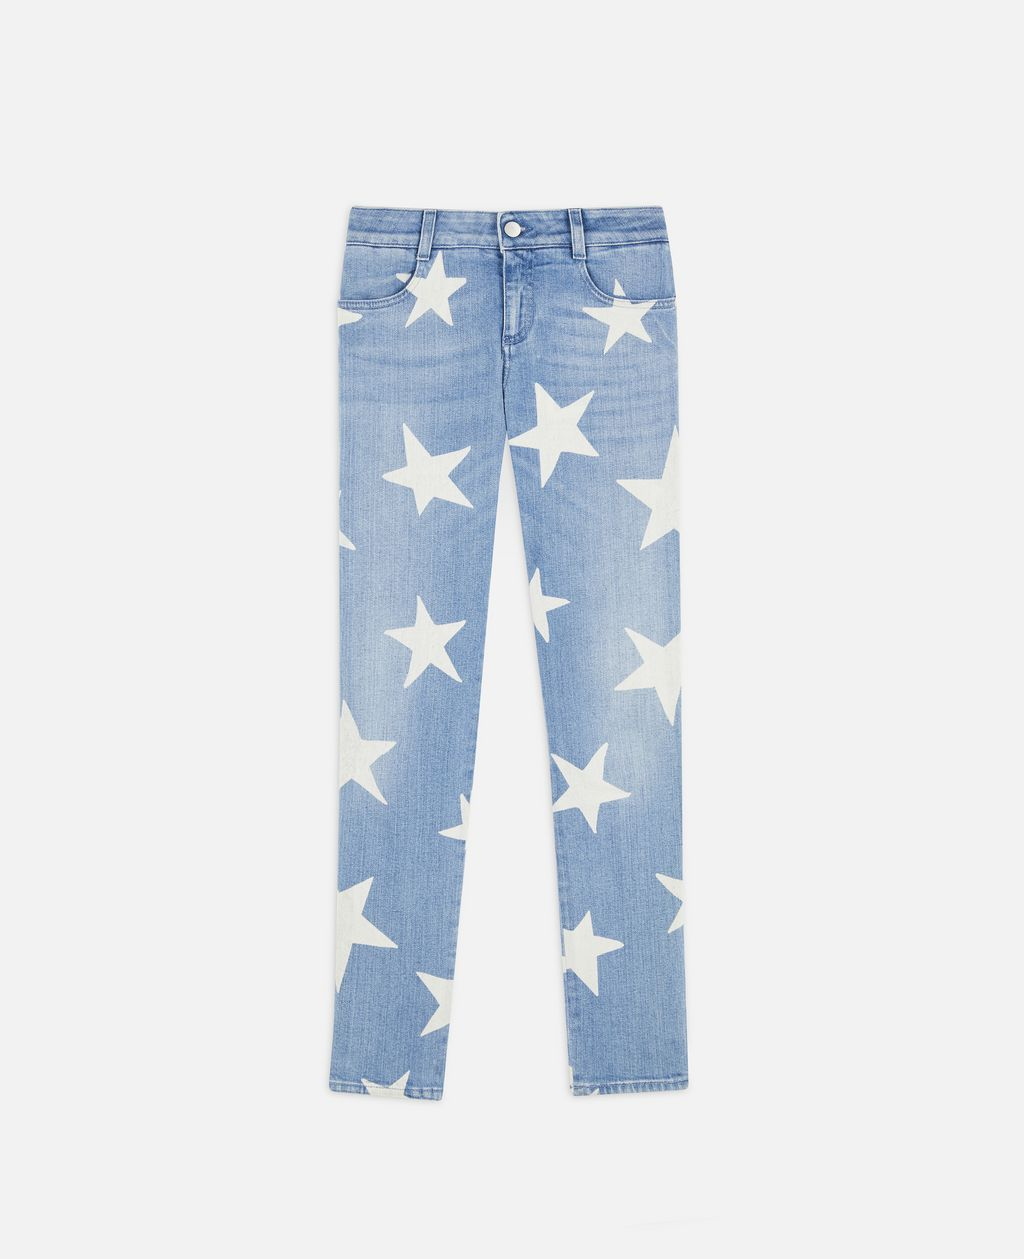 Skinny Ankle Grazer Star Jeans - STELLA MCCARTNEY